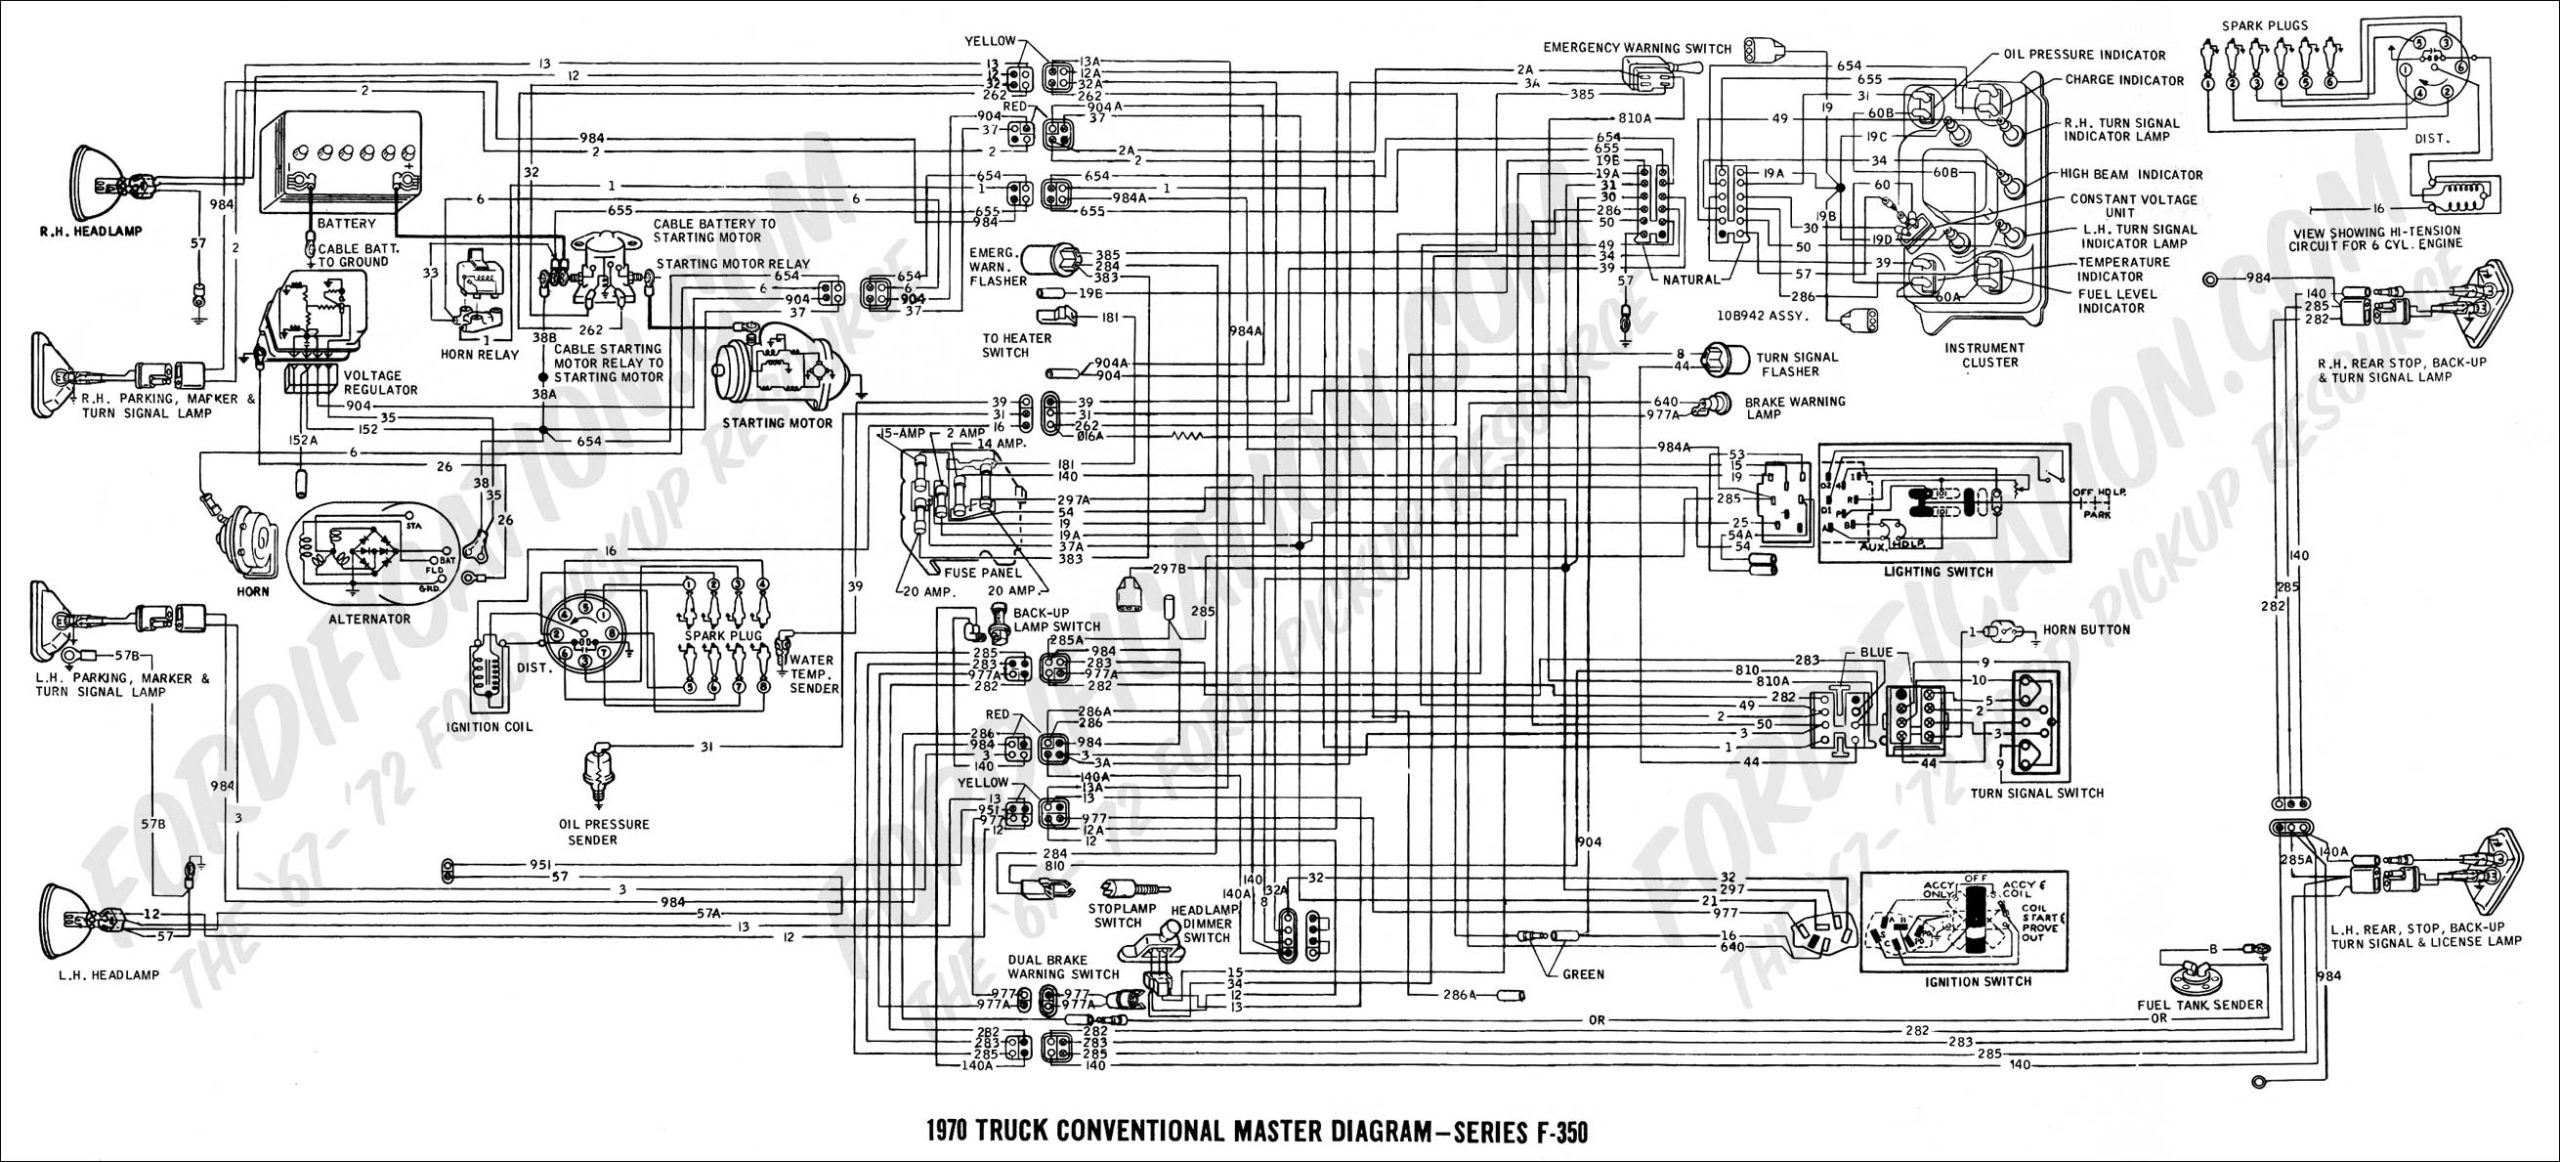 2008 F150 Trailer Wiring Diagram